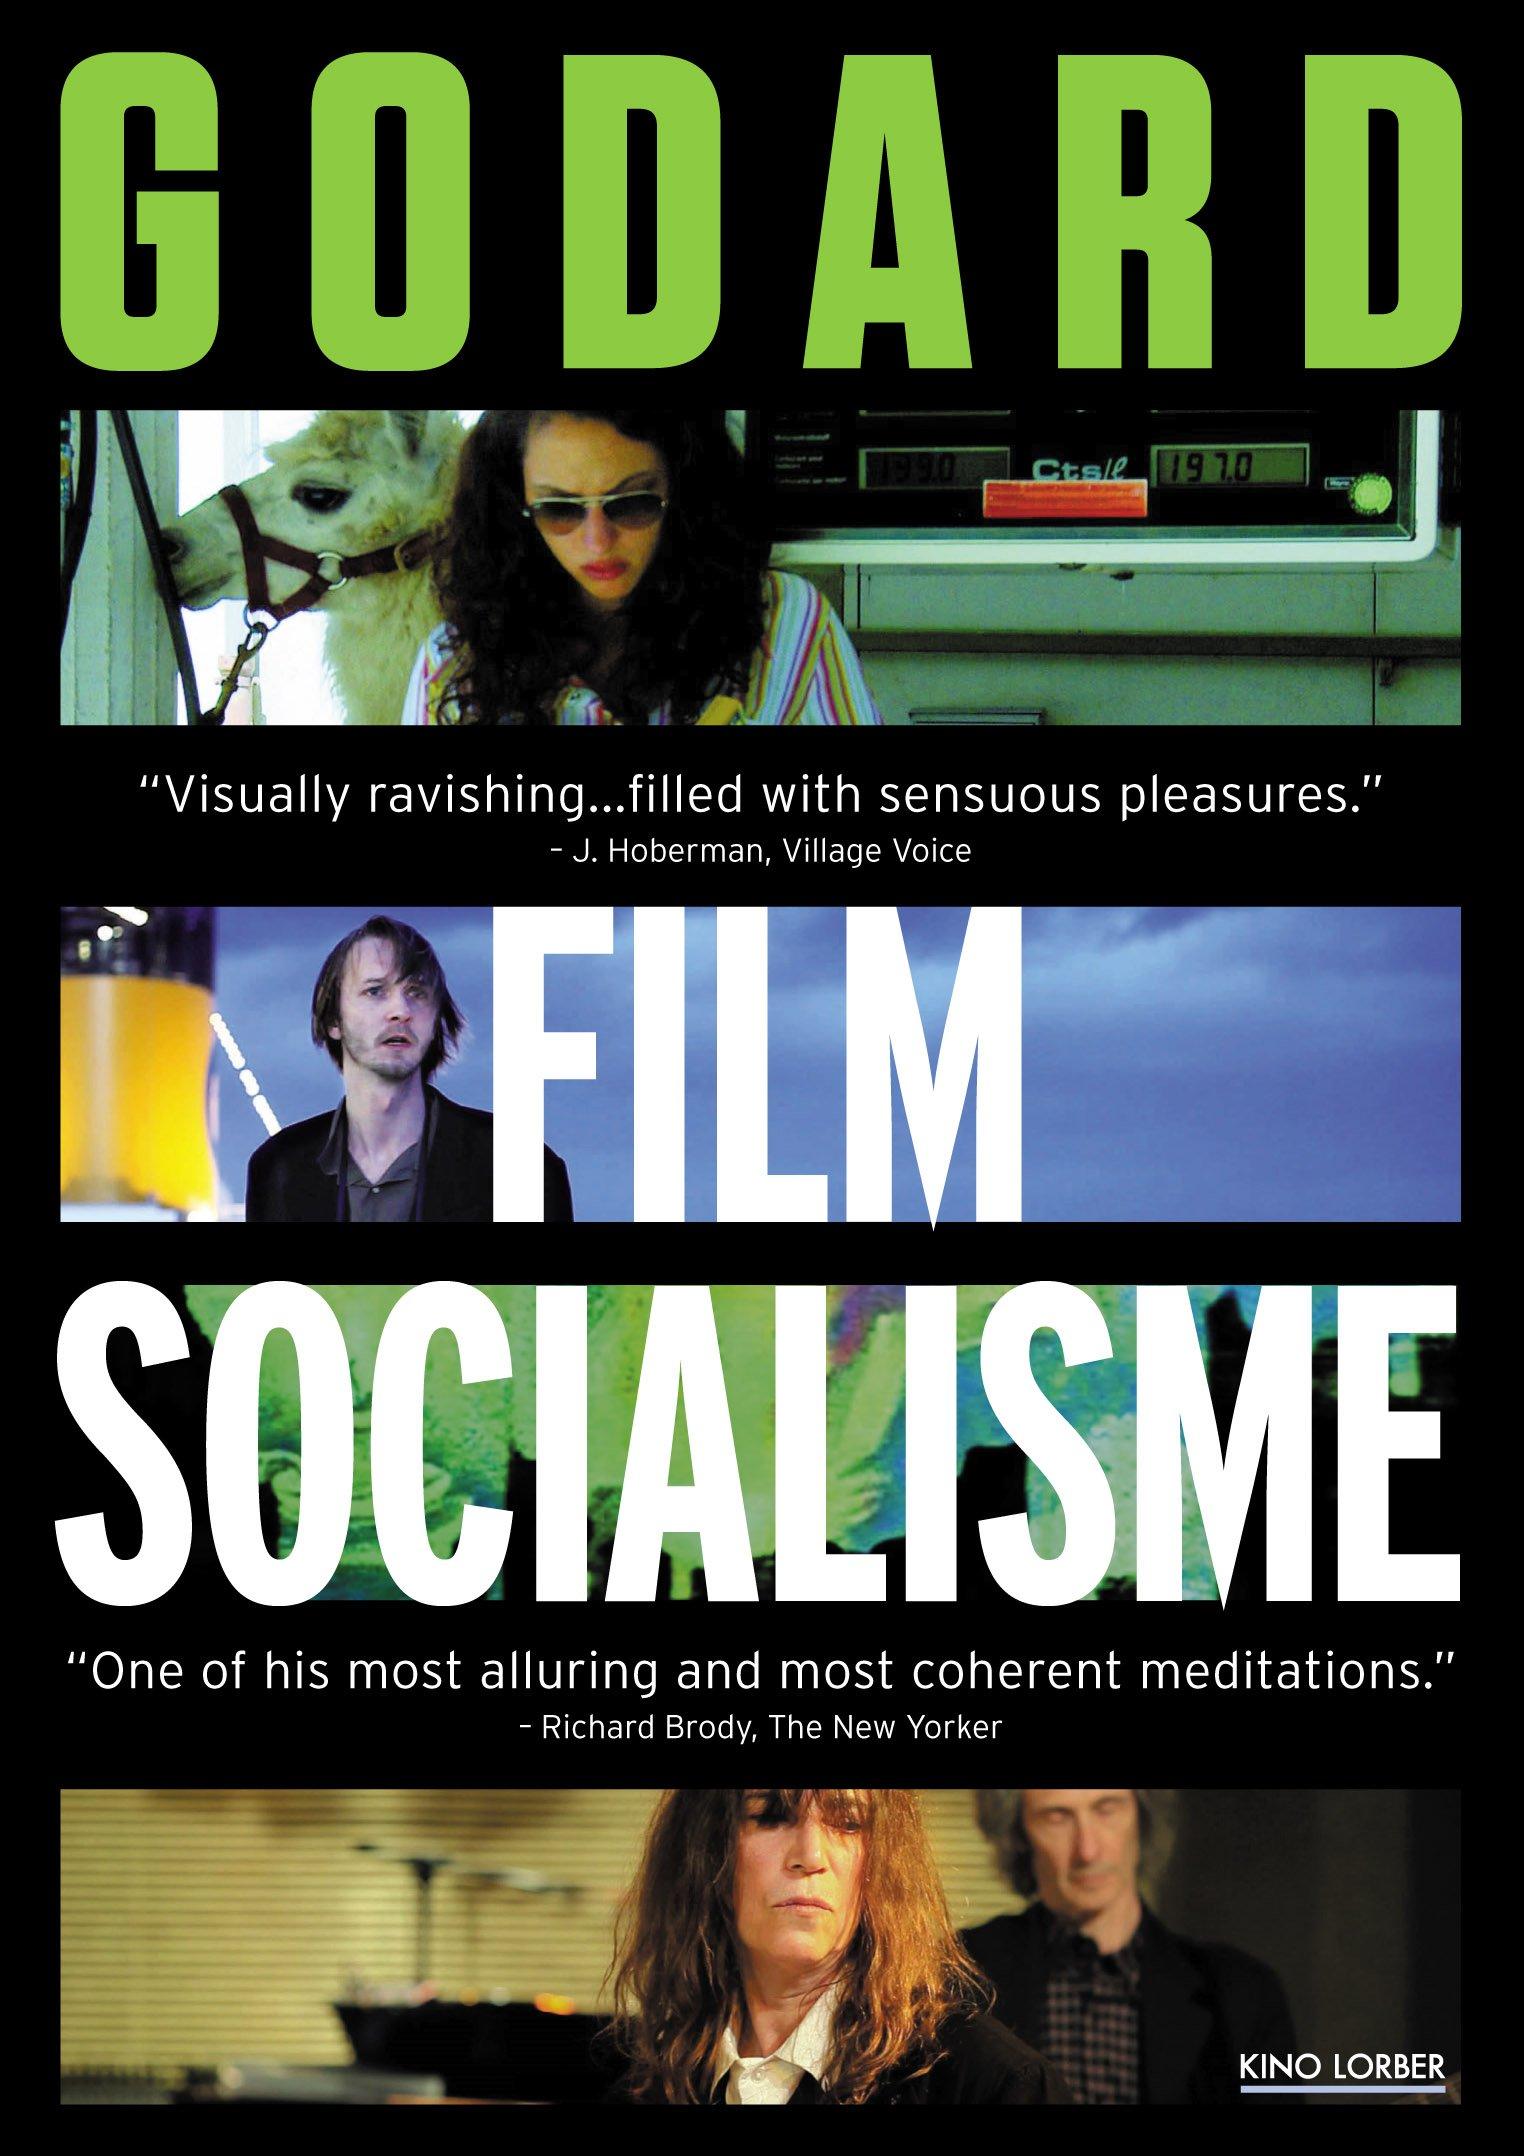 DVD : Eye Ha dara - Film Socialisme (Subtitled)